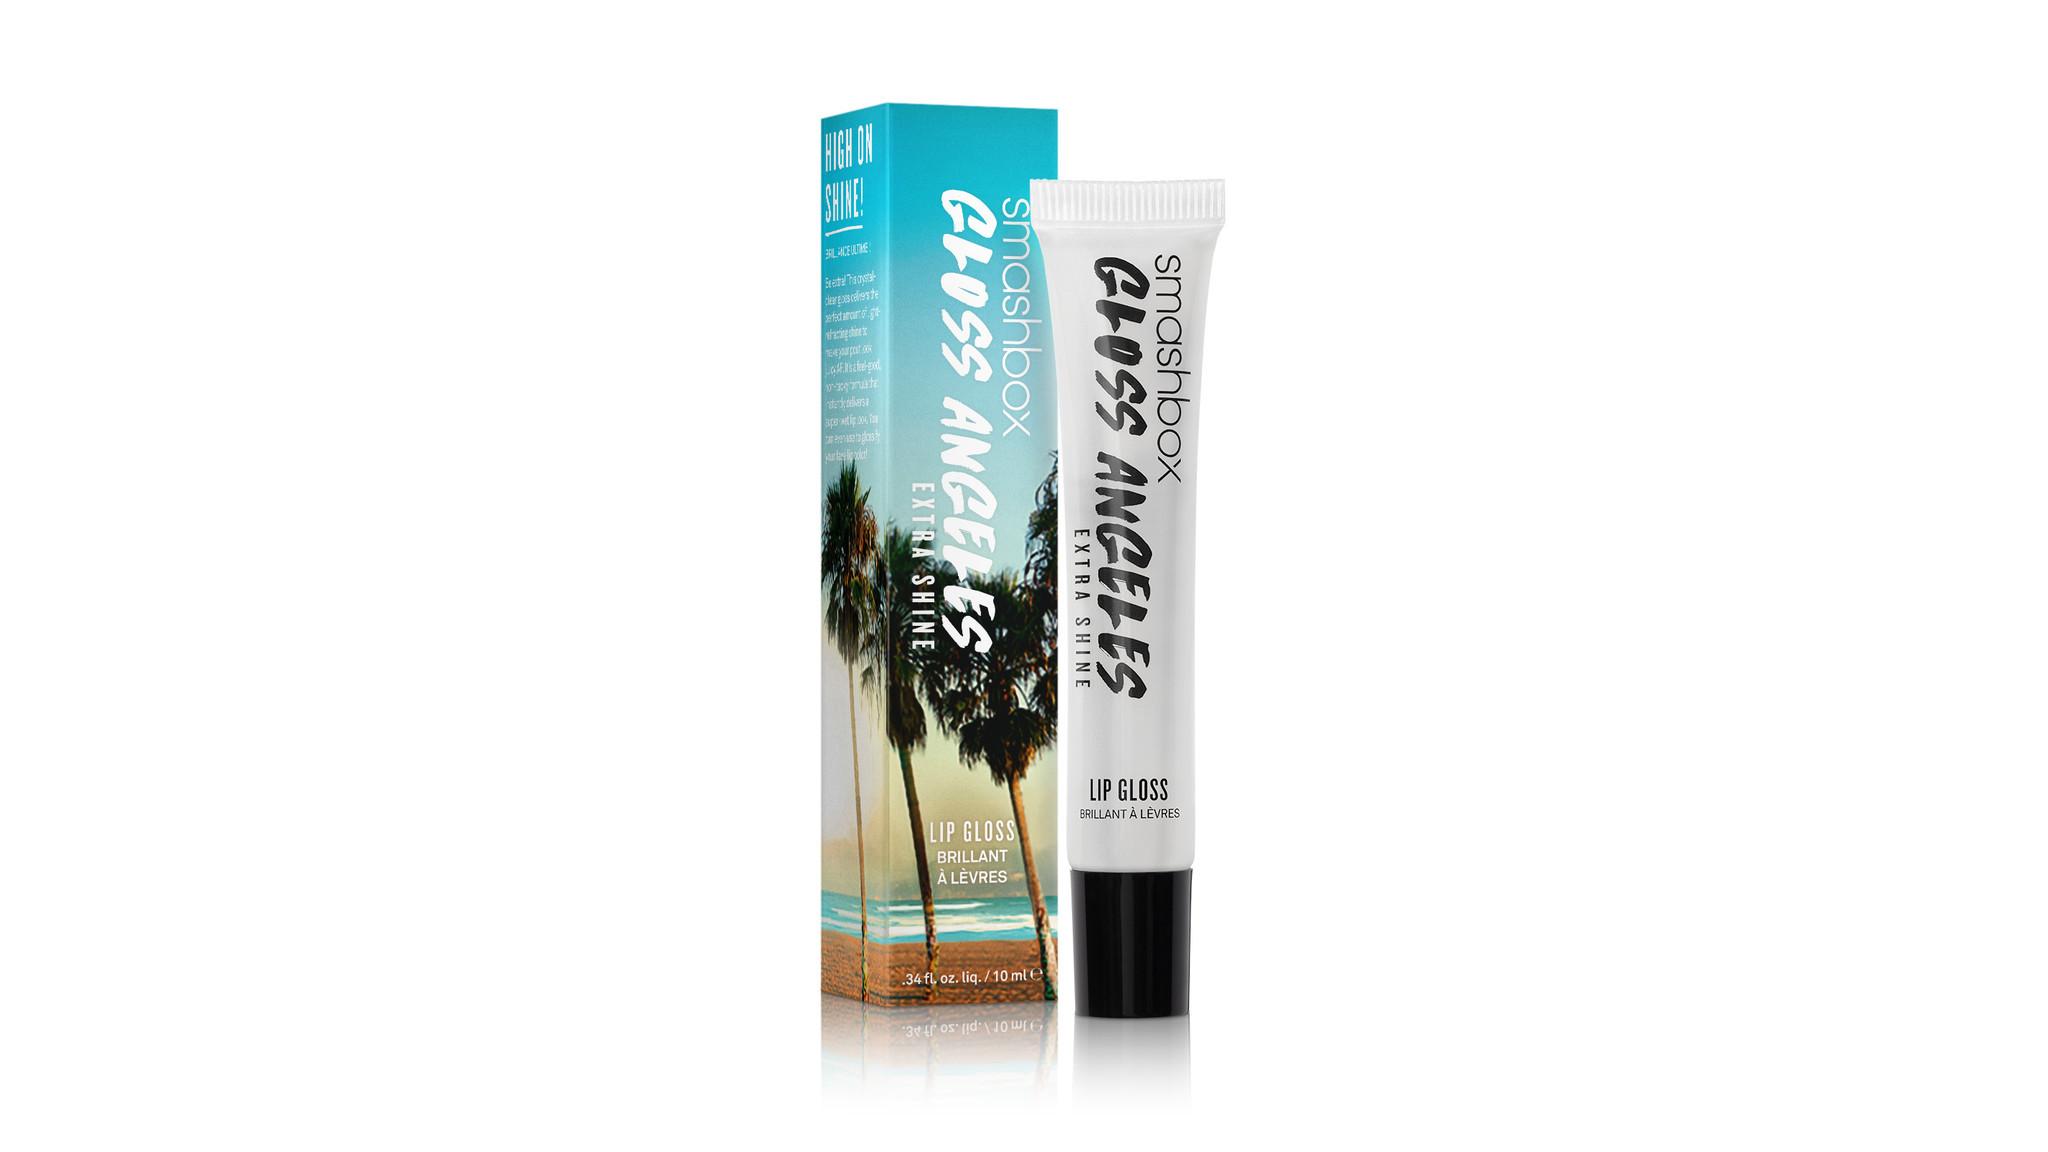 Smashbox Gloss Angeles Extra Shine crystal-clear lip gloss, $19 at Smashbox in Venice, smashbox.com